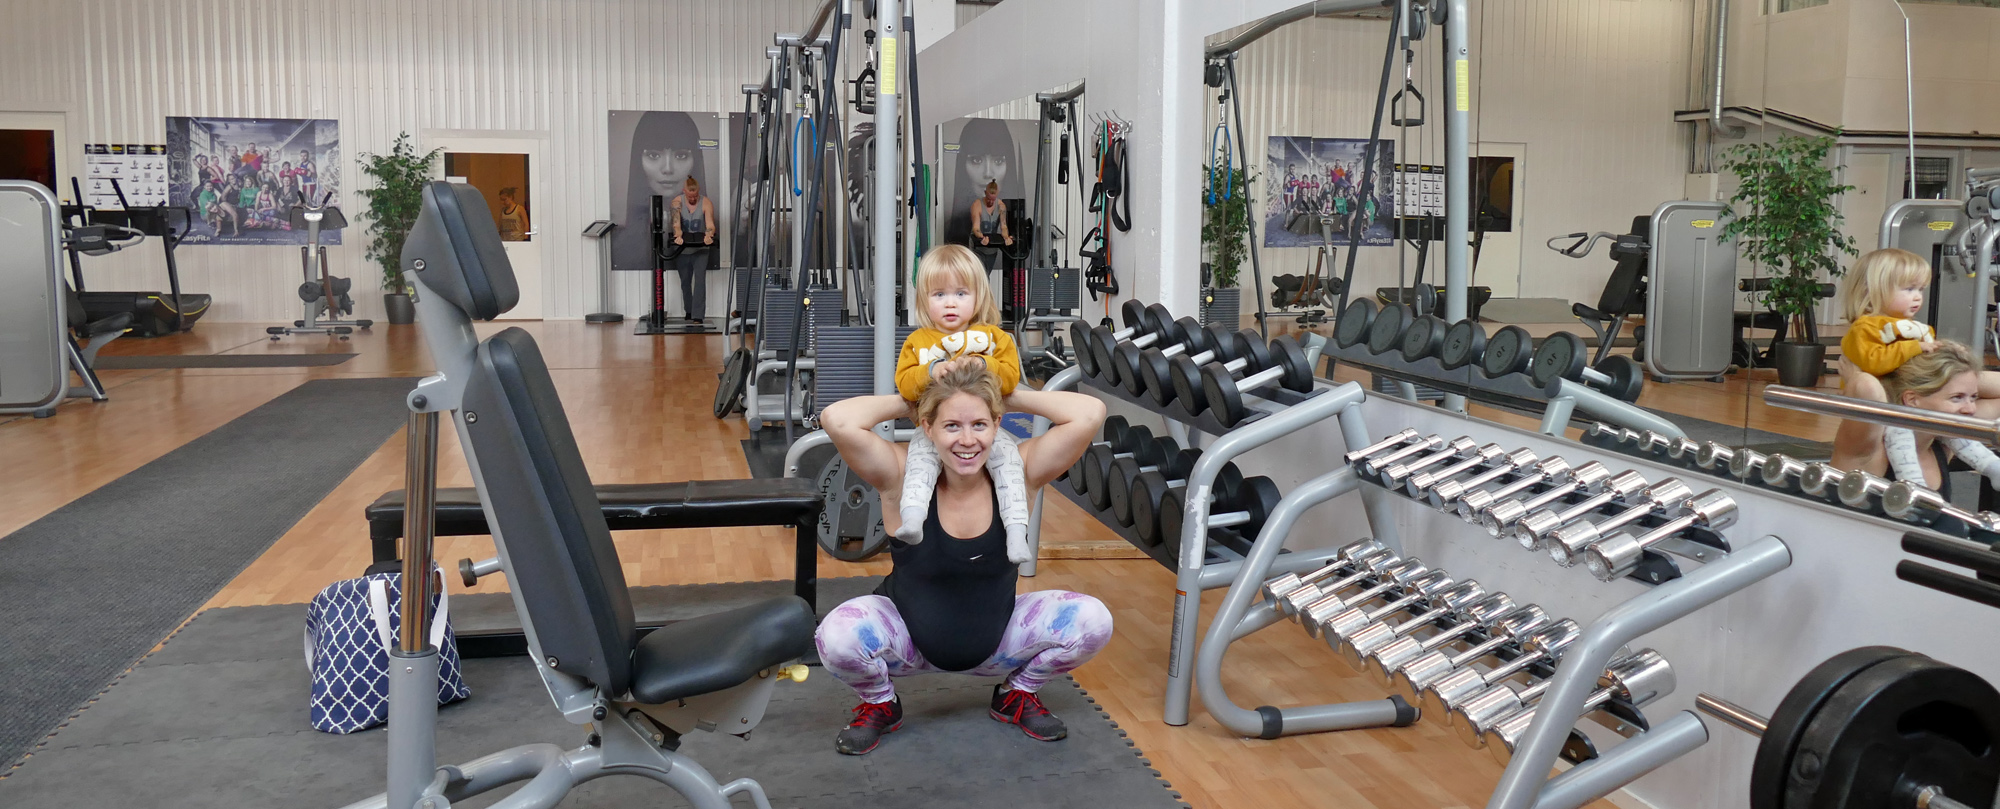 gymprogram tredje trimestern